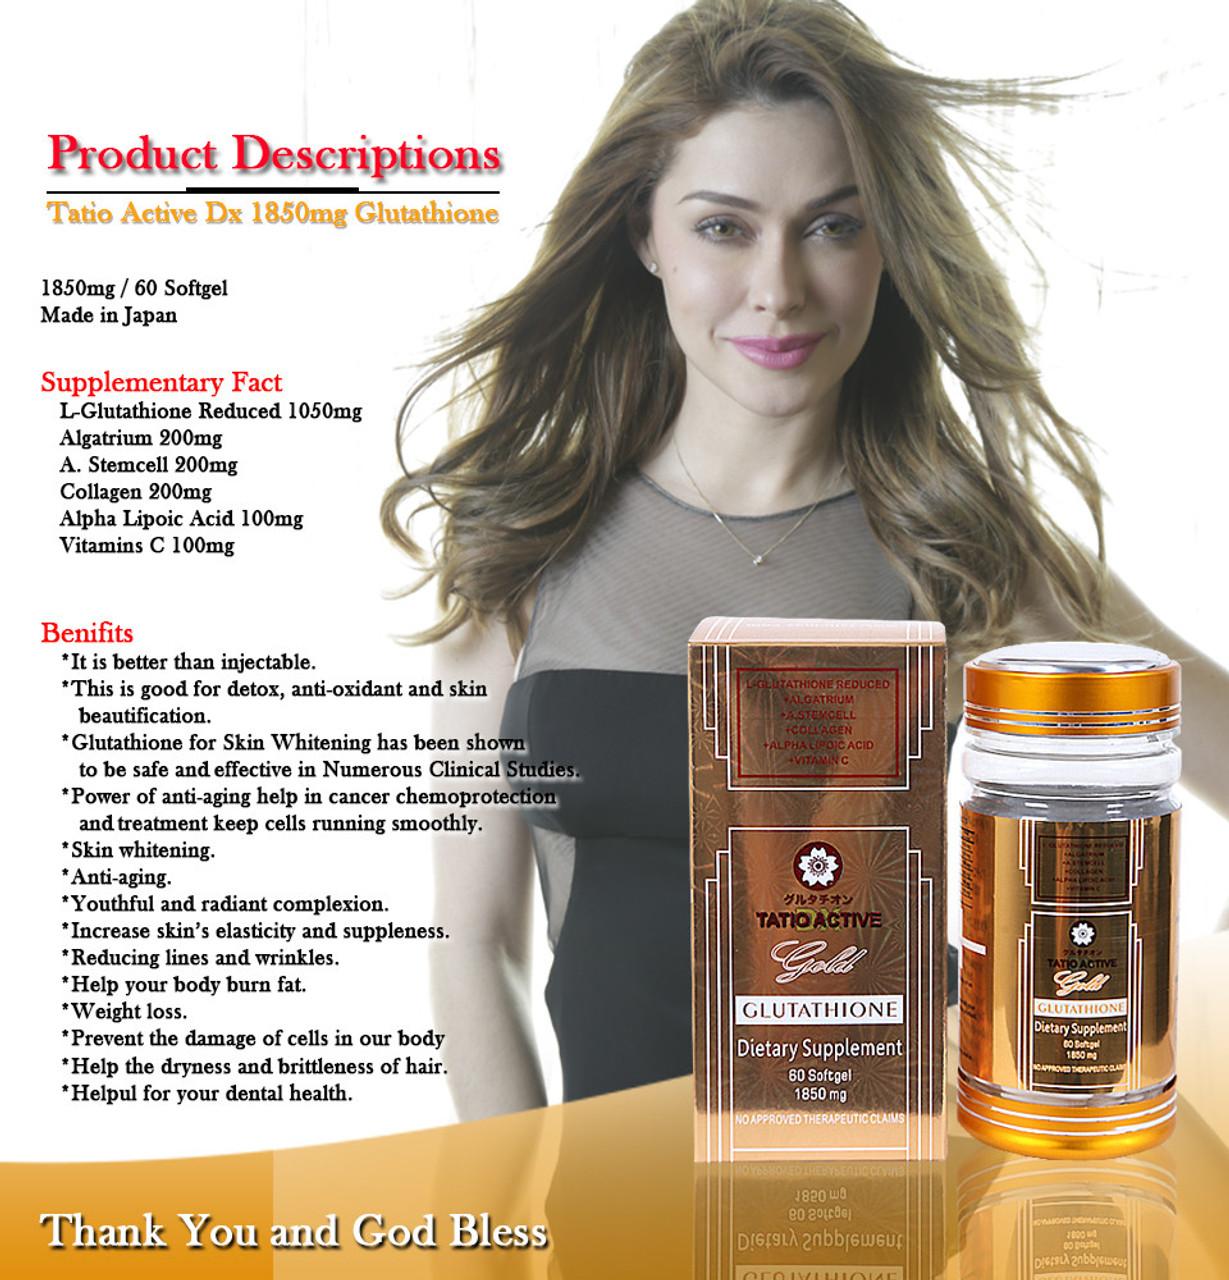 2x TATIO ACTIVE Gold 1850mg L-Glutathione Skin Whitening Capsules and RELUMINS Vitamin C 180 Capsules